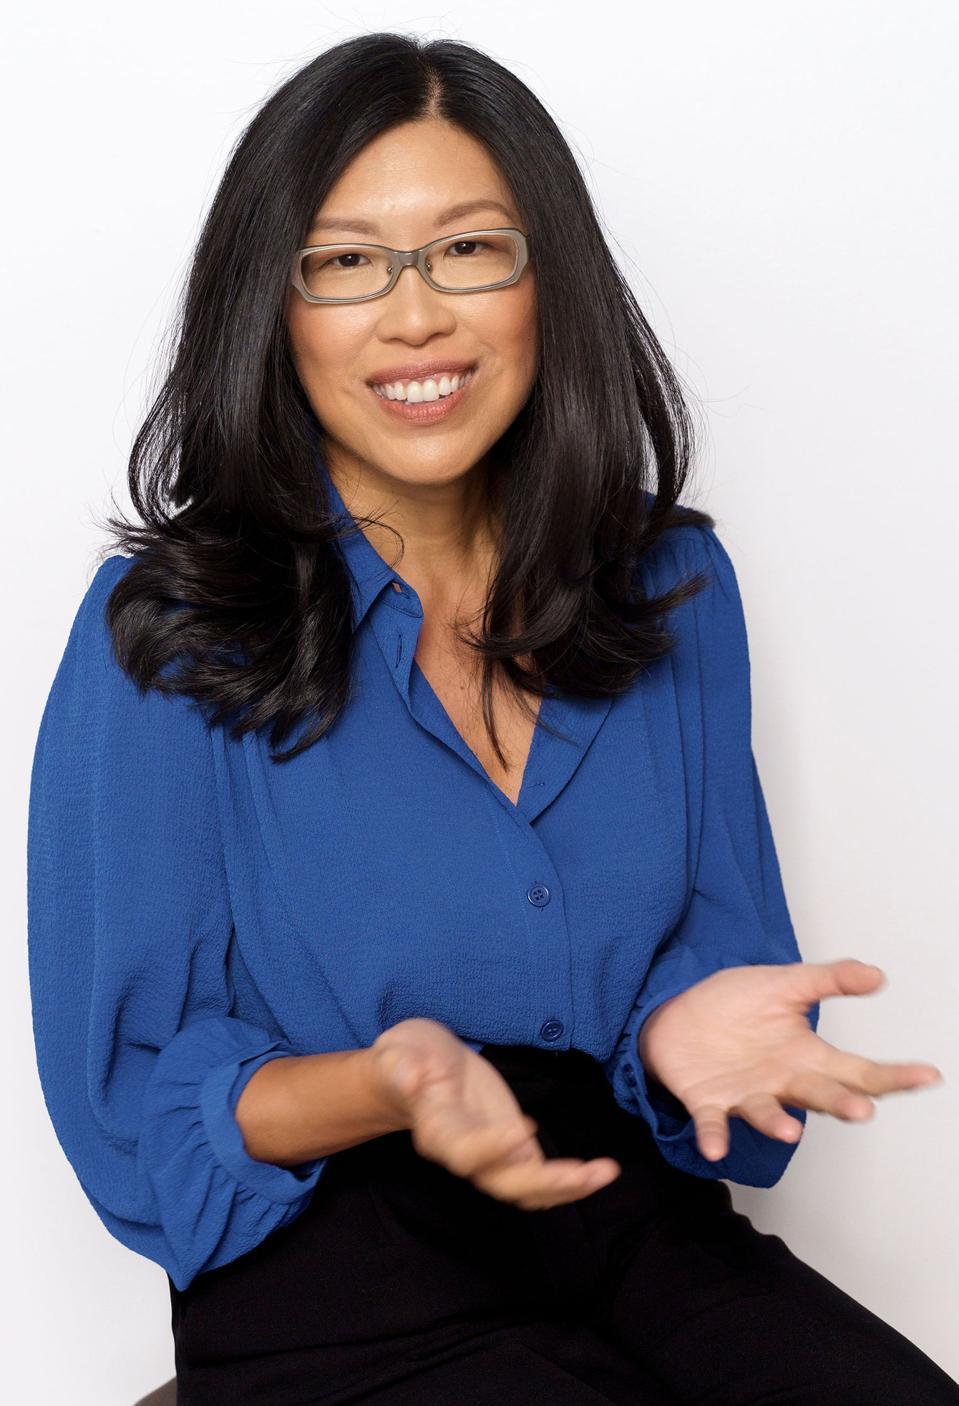 M13's Christine Choi on CCO's Avoiding Human Shortcuts